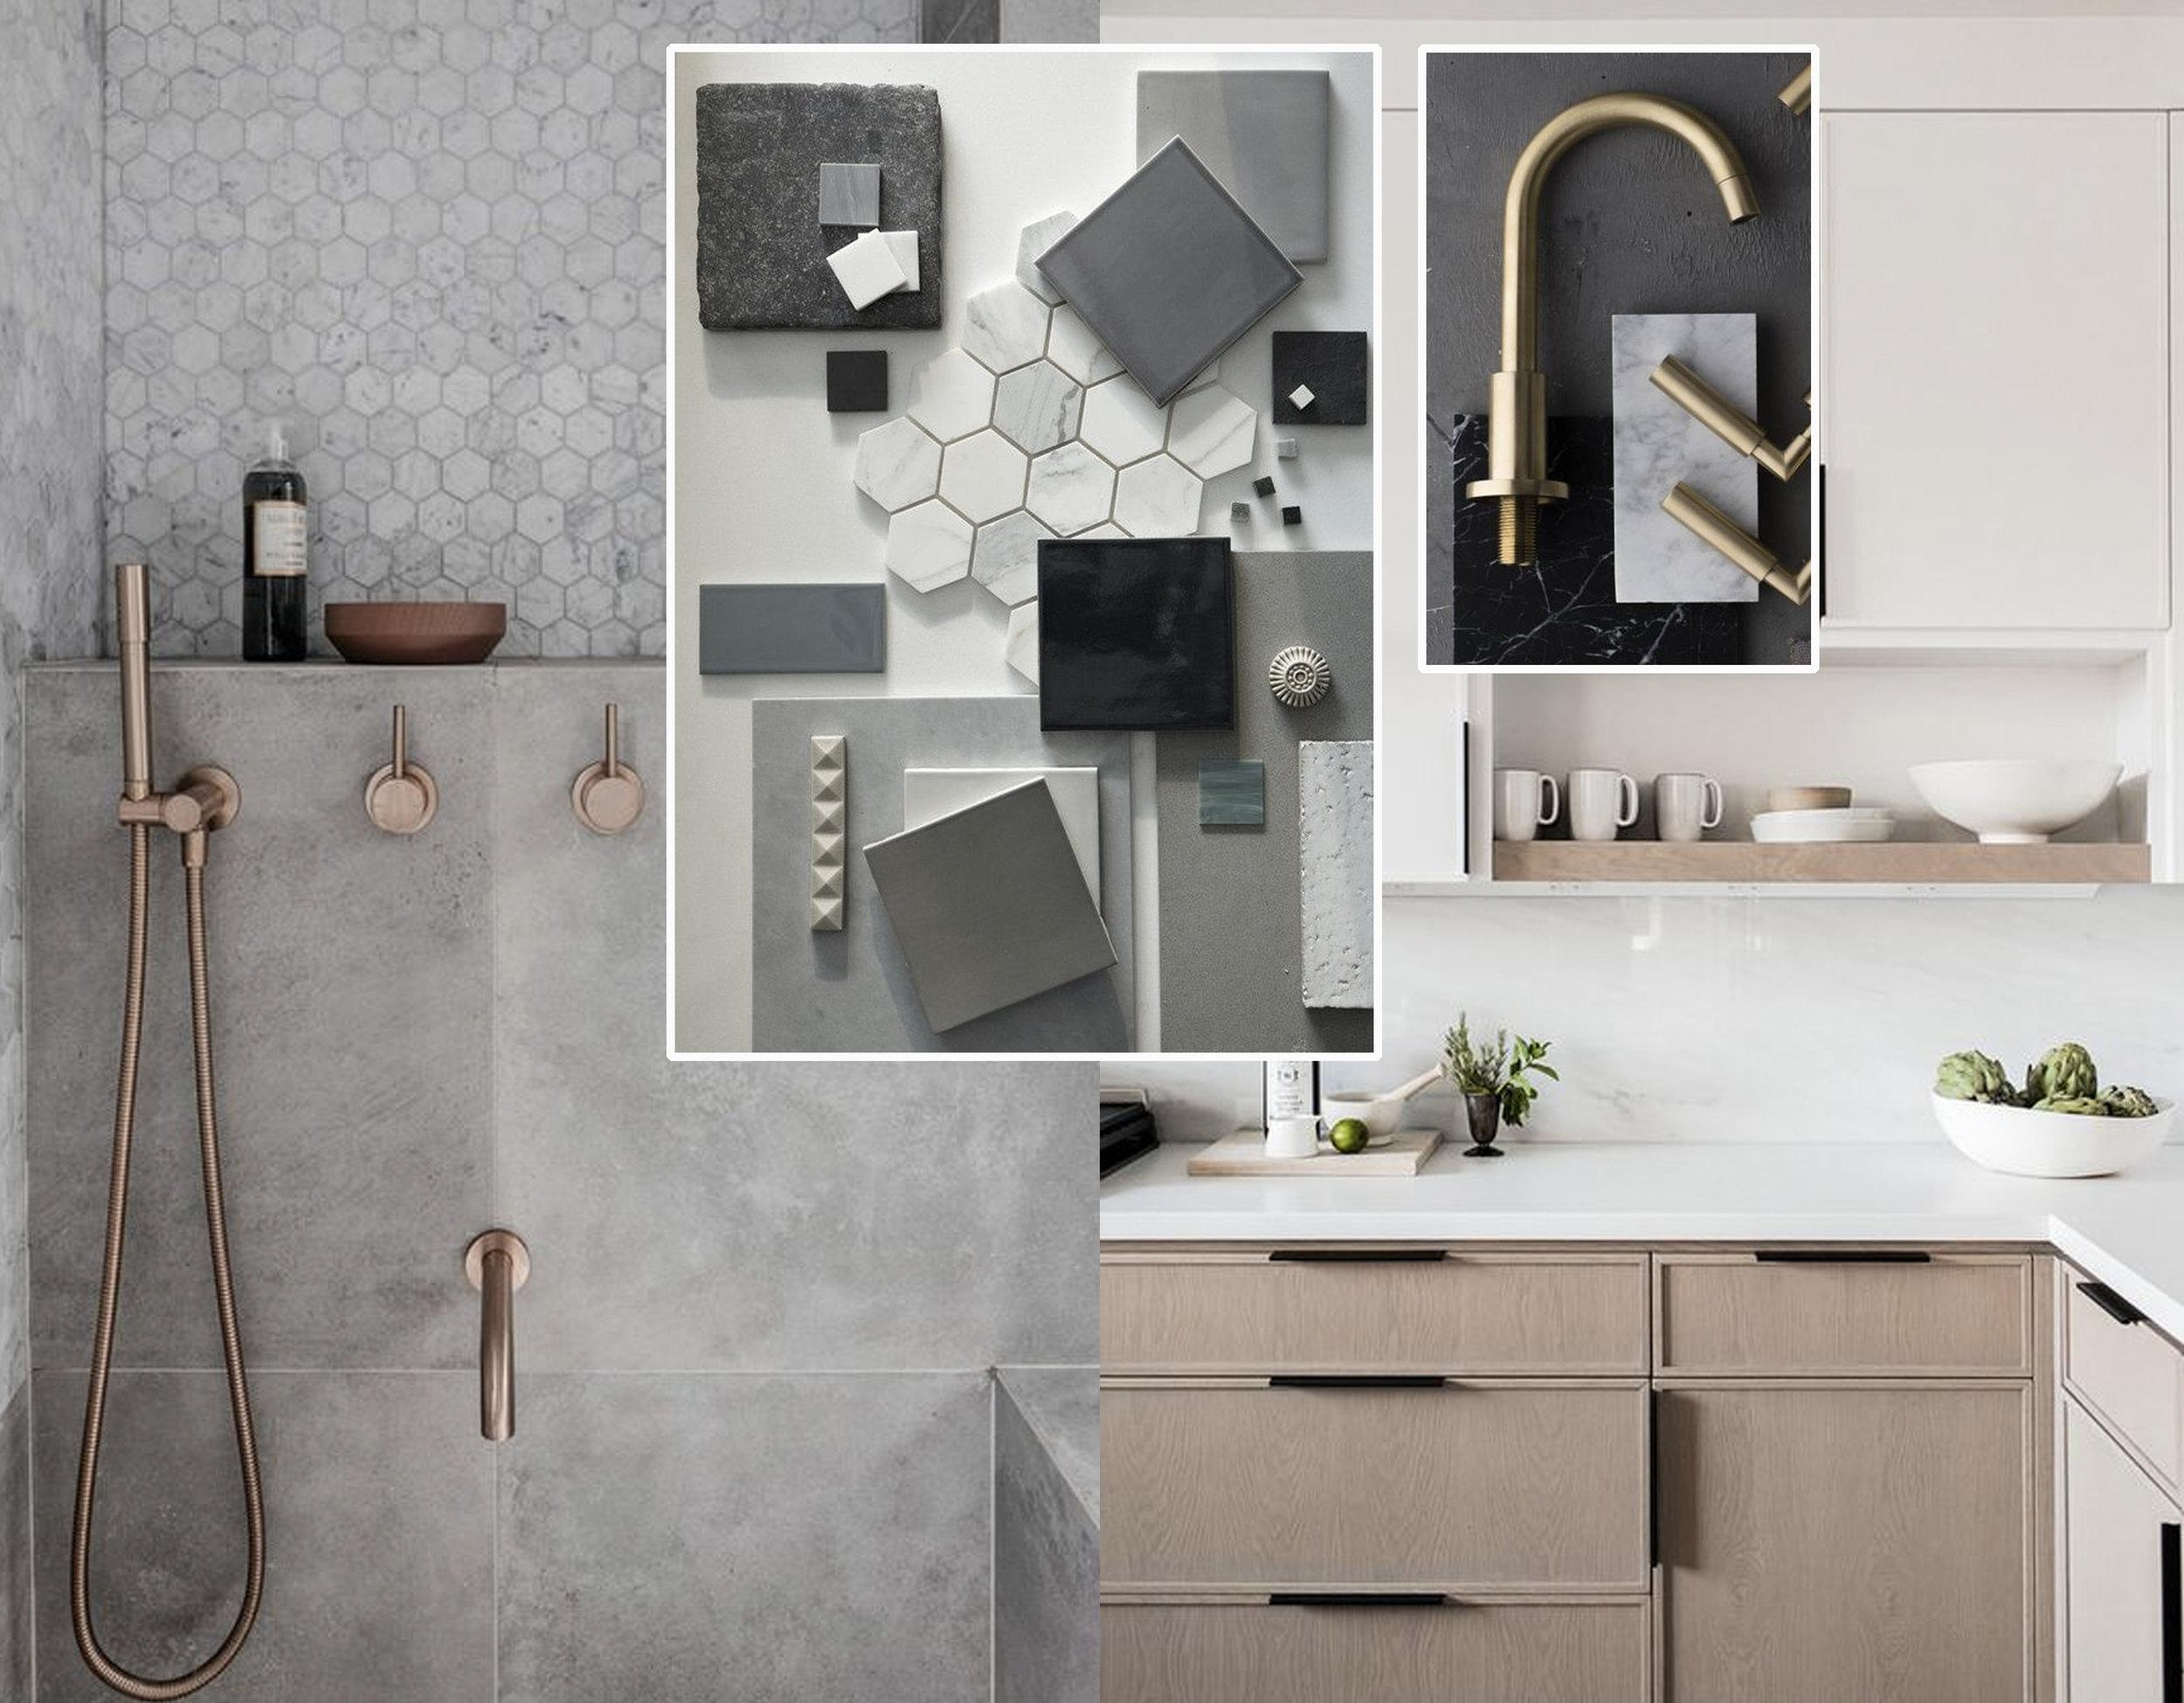 bathroom image via  Emily Henderson  - material mood board via  Waterworks  - faucets via  Boco Da Lobo  - kitchen image via  Studio McGee